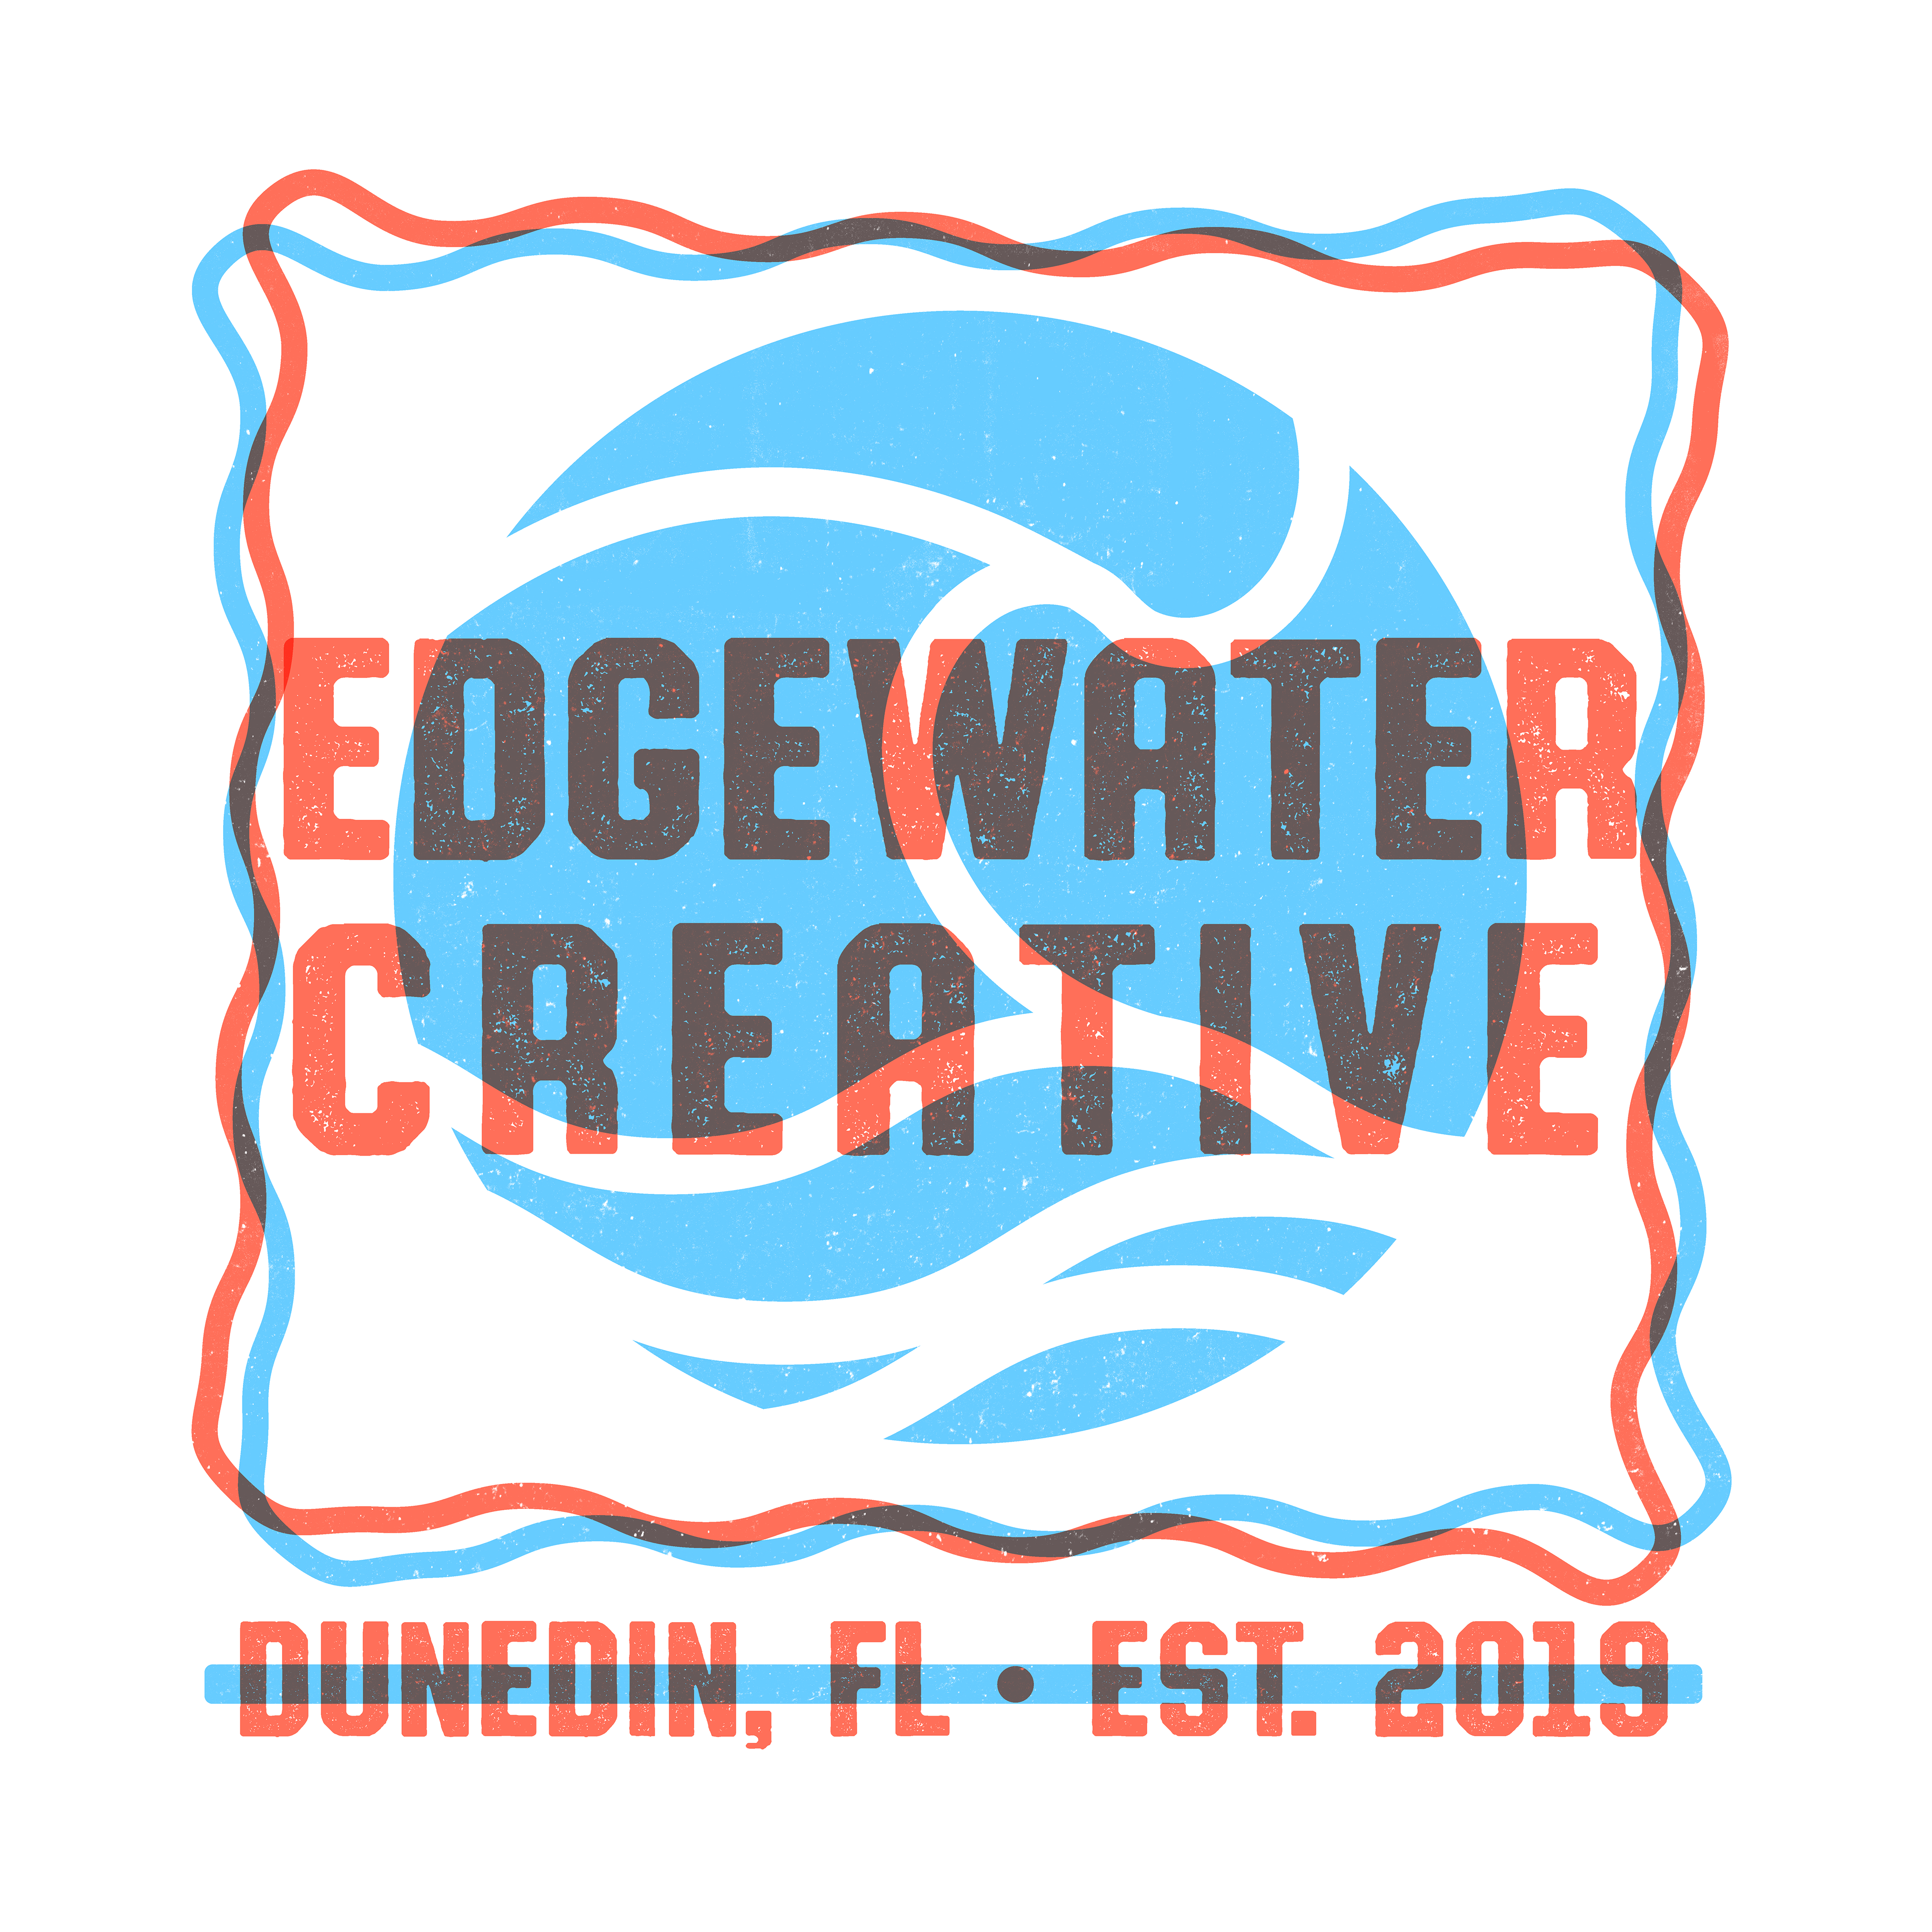 Edgewater Creative Florida